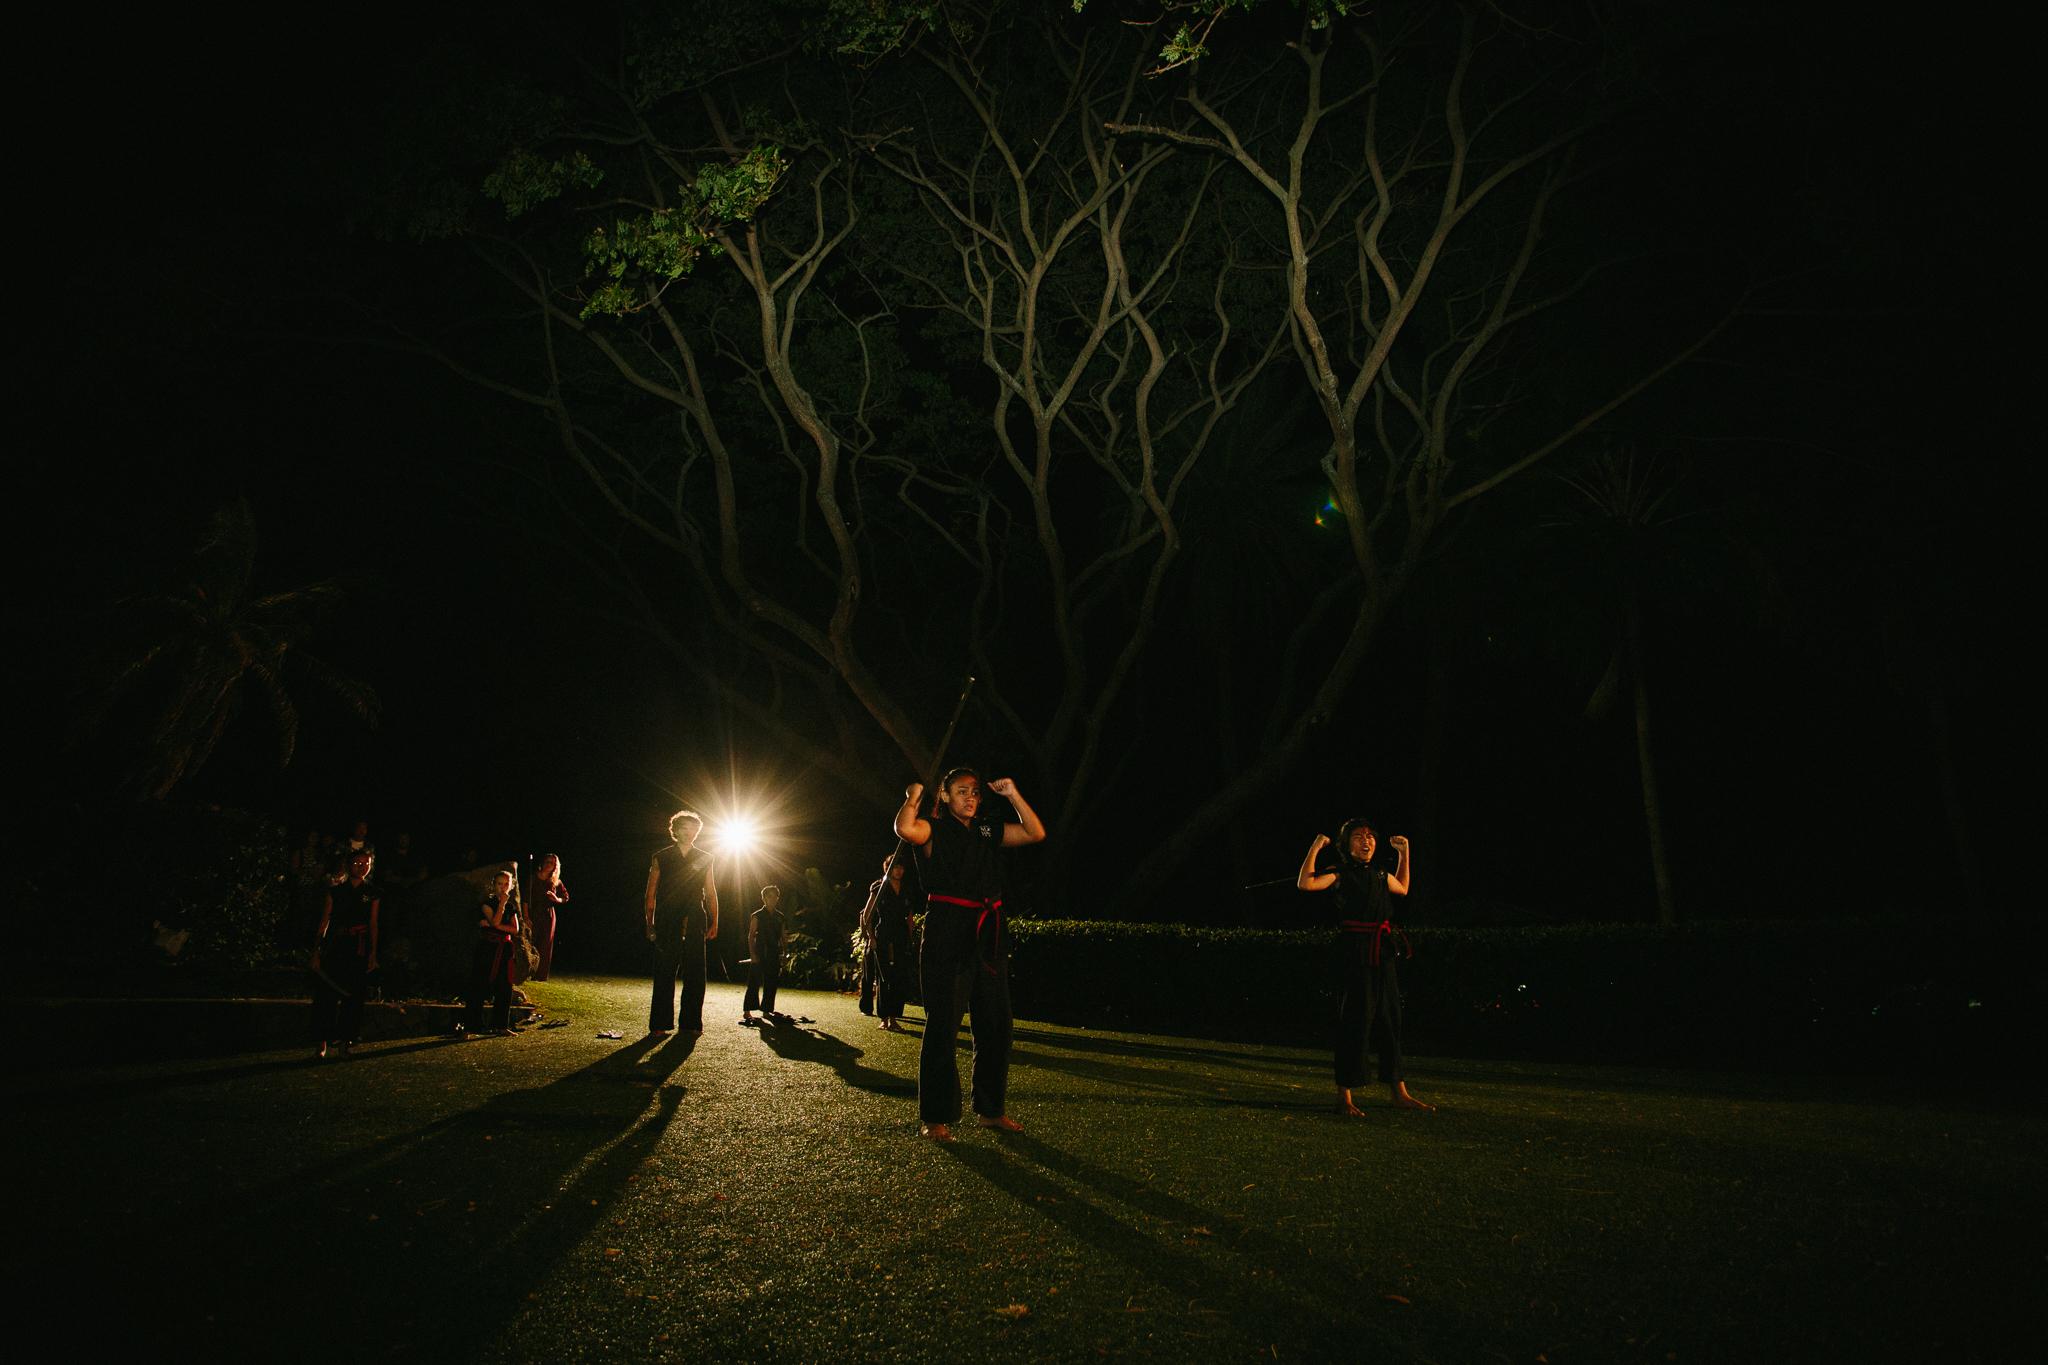 Kualoa_Ranch_Wedding_Photographer_Tone_Hawaii-36.jpg